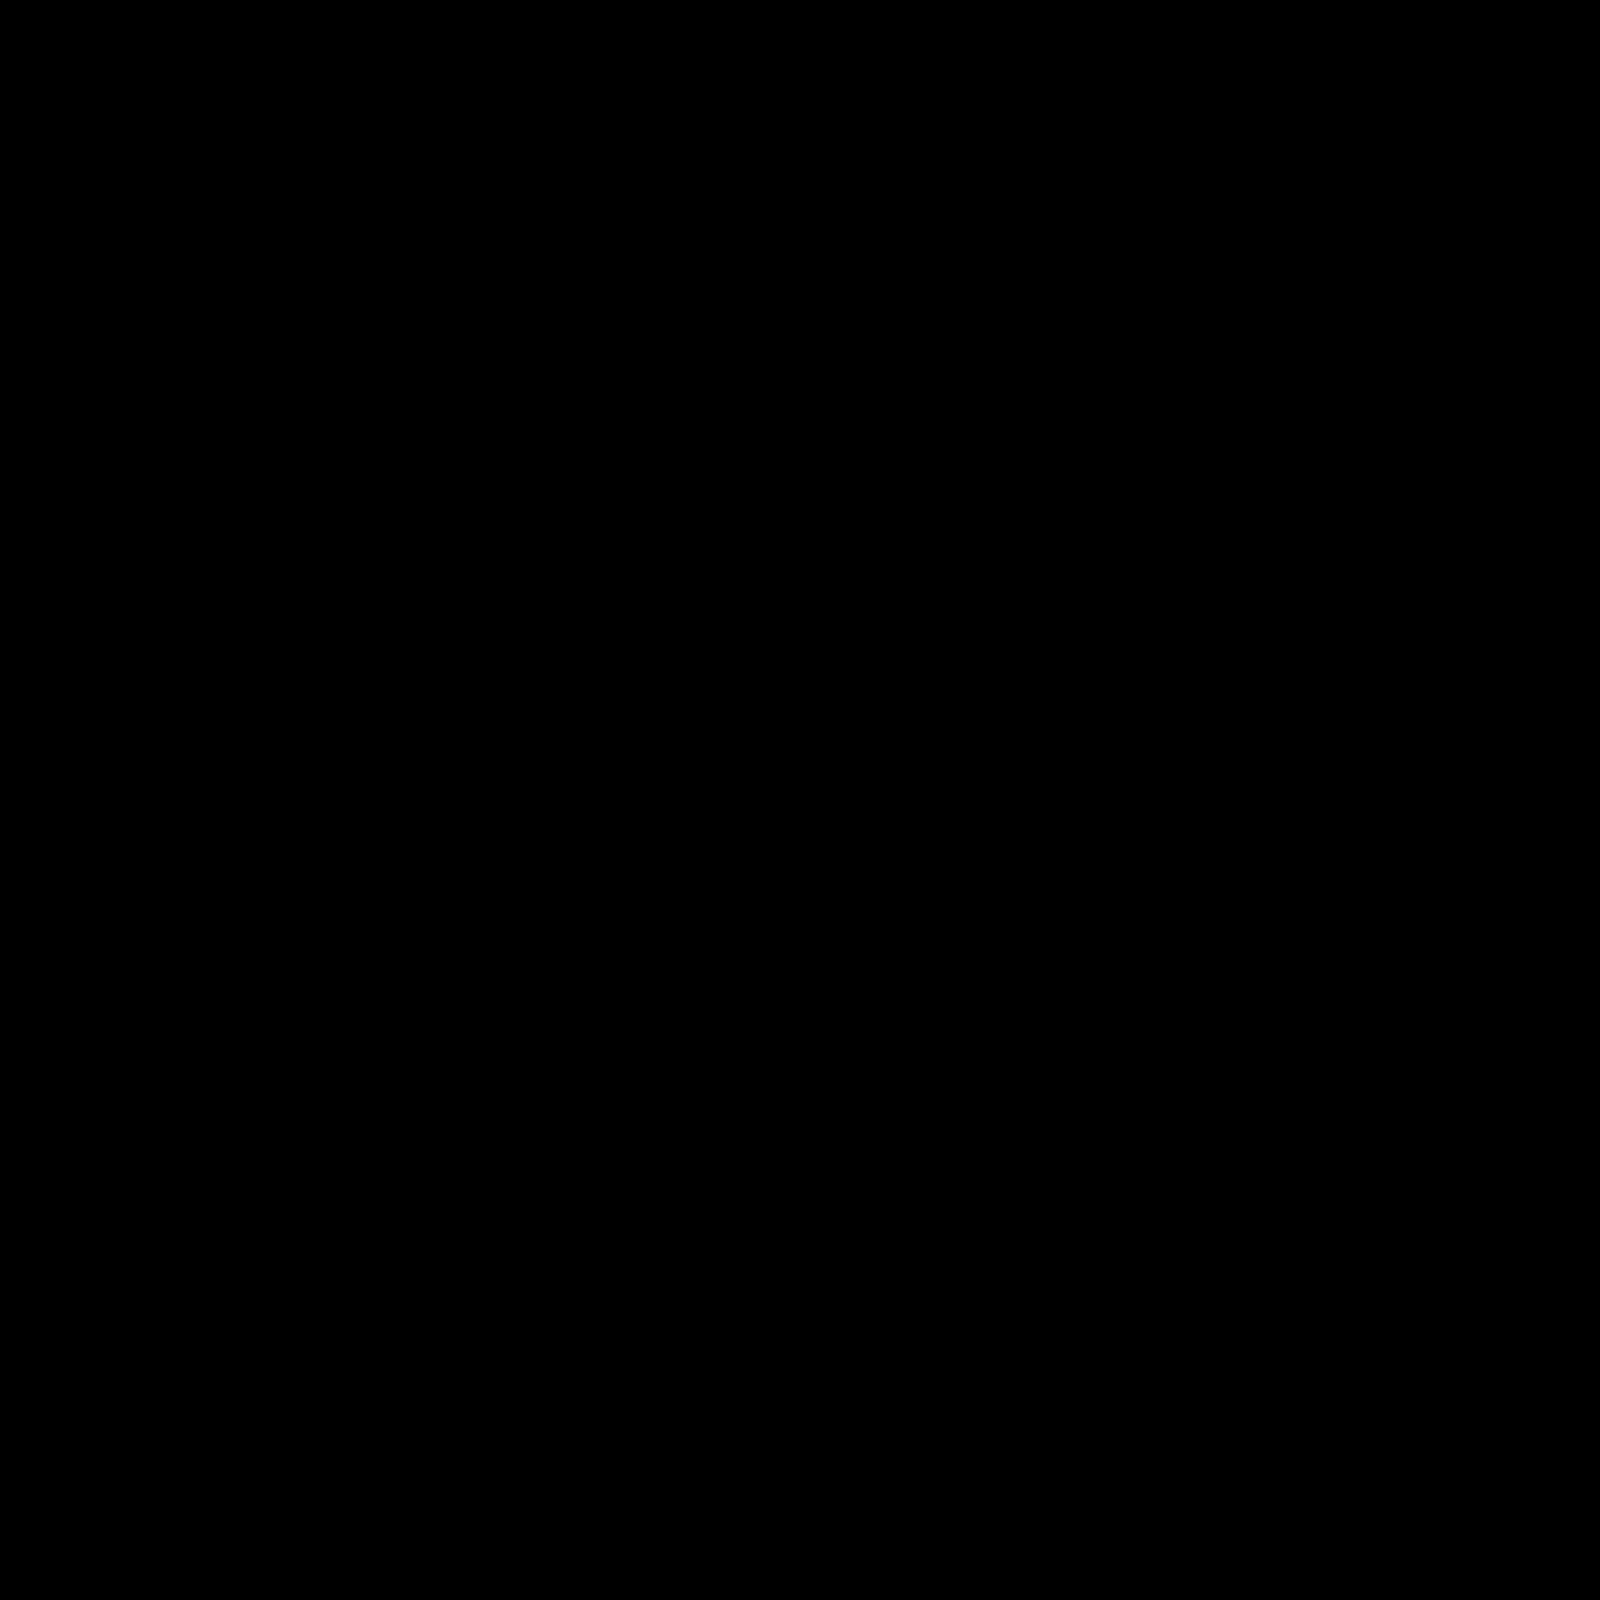 Ныряние icon